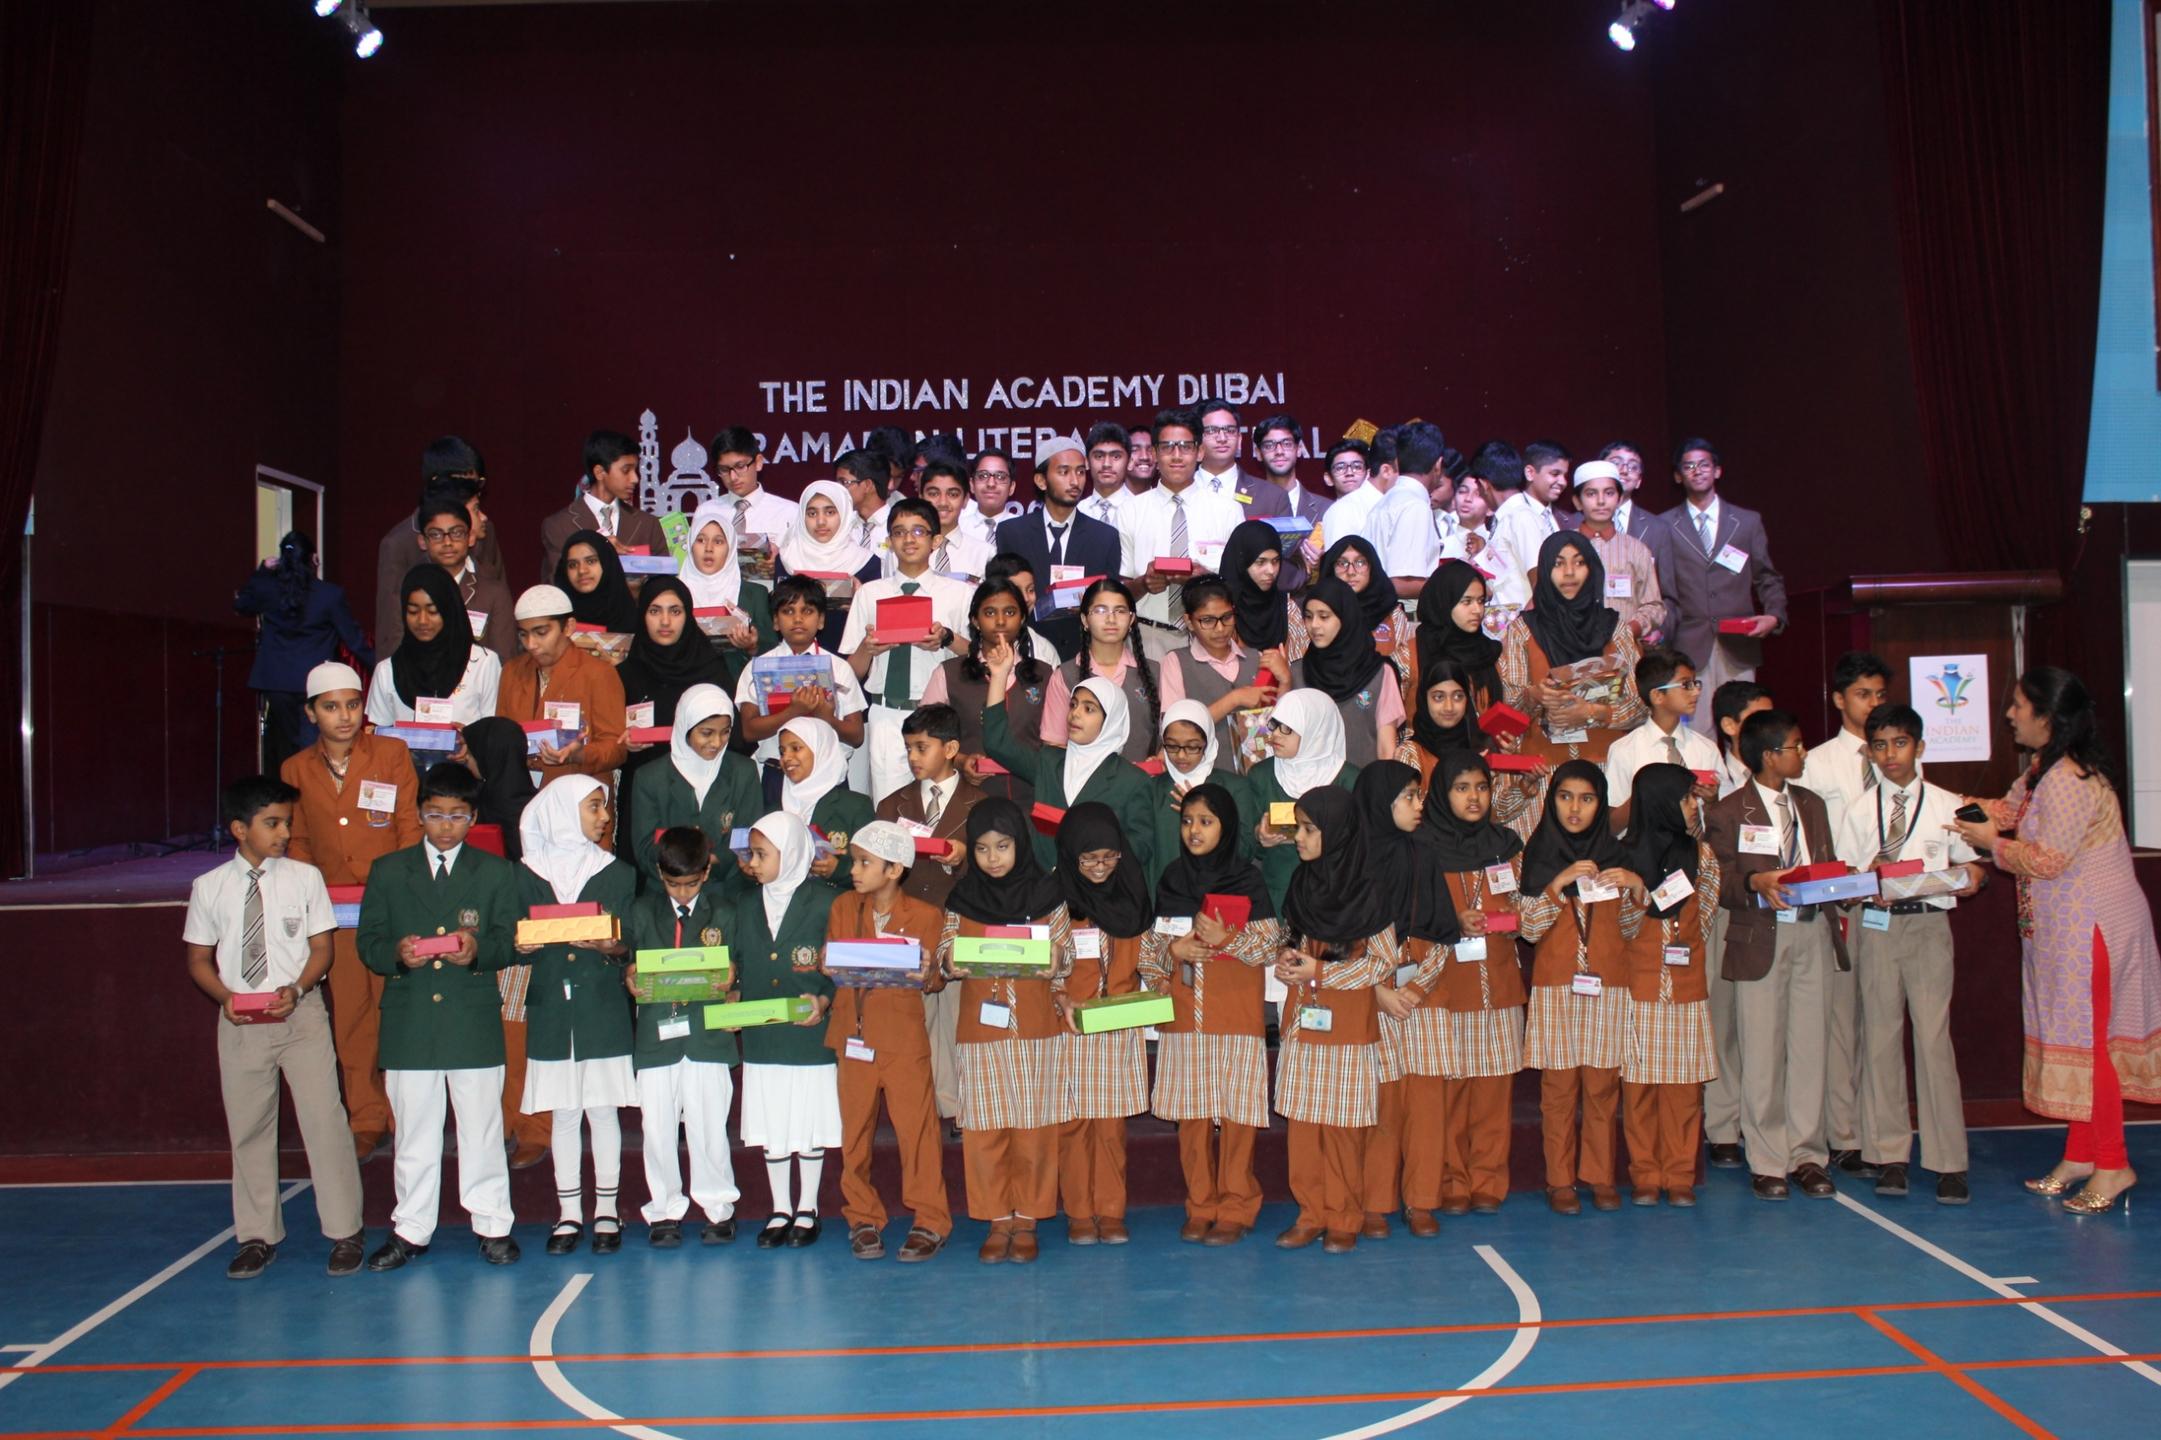 The Indian Academy Dubai (@theindianacademy) Cover Image